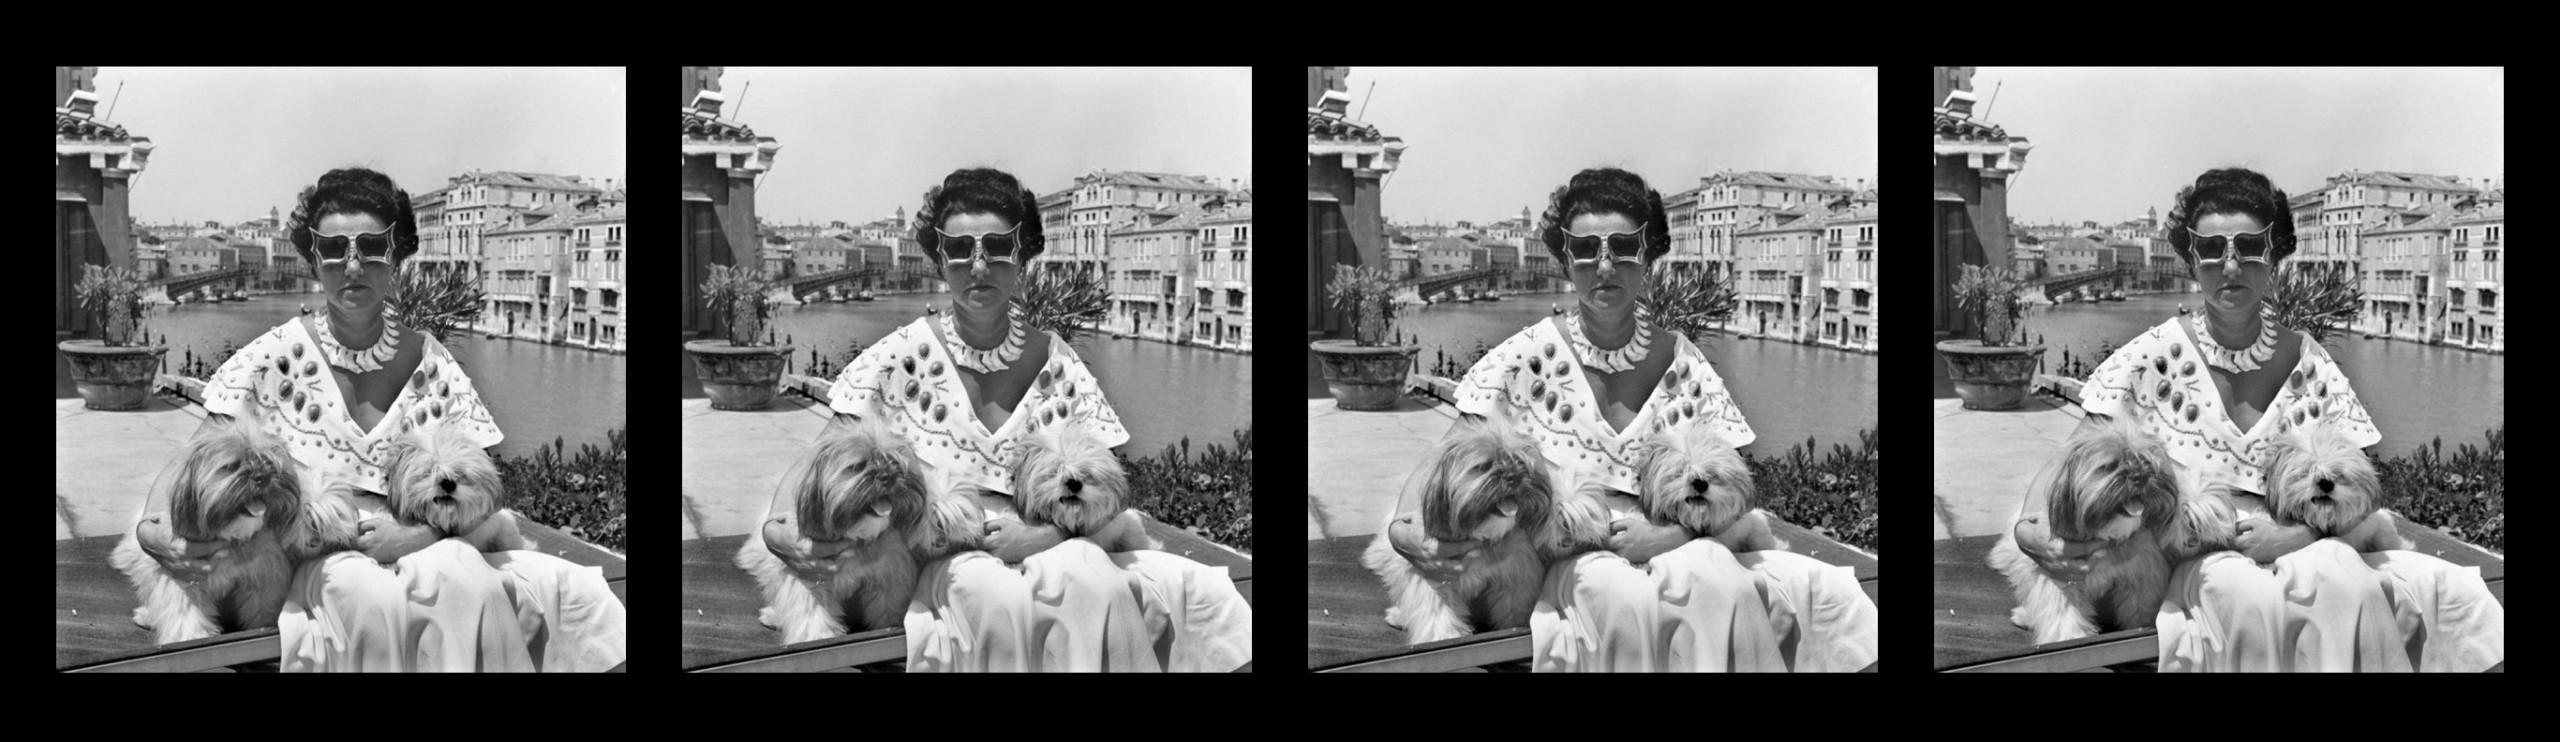 <Peggy Guggenheim> <Historical Heroines> <Darklight Art> <Art Collector> <Art Addict> <Female Collectors> <Darklight Art>